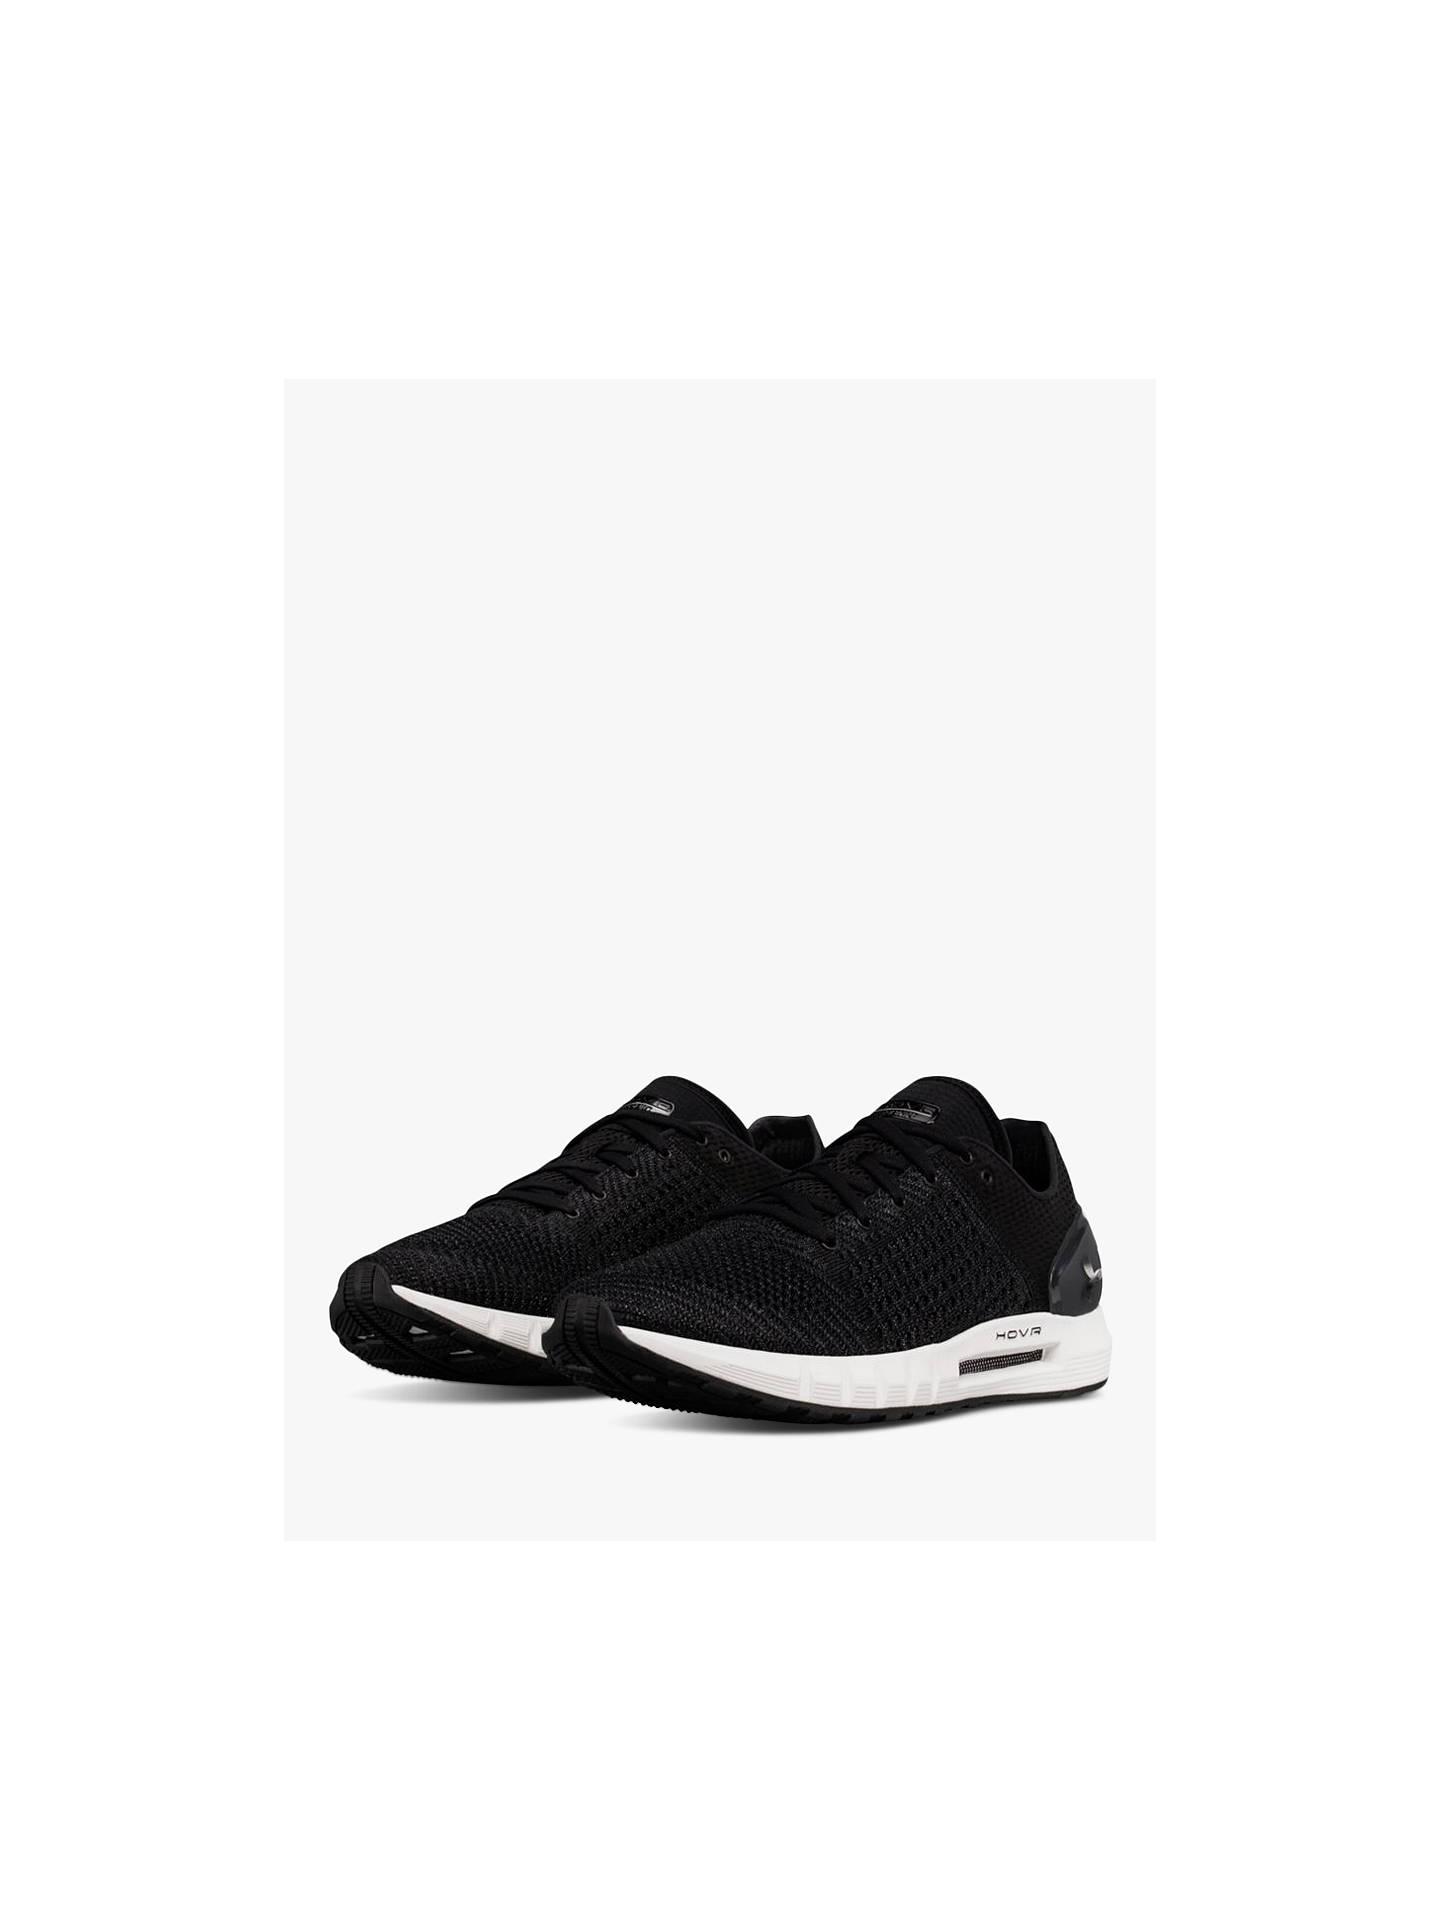 quality design 42ef0 c3da8 Under Armour HOVR Sonic Men's Running Shoes, Black/Ivory at ...